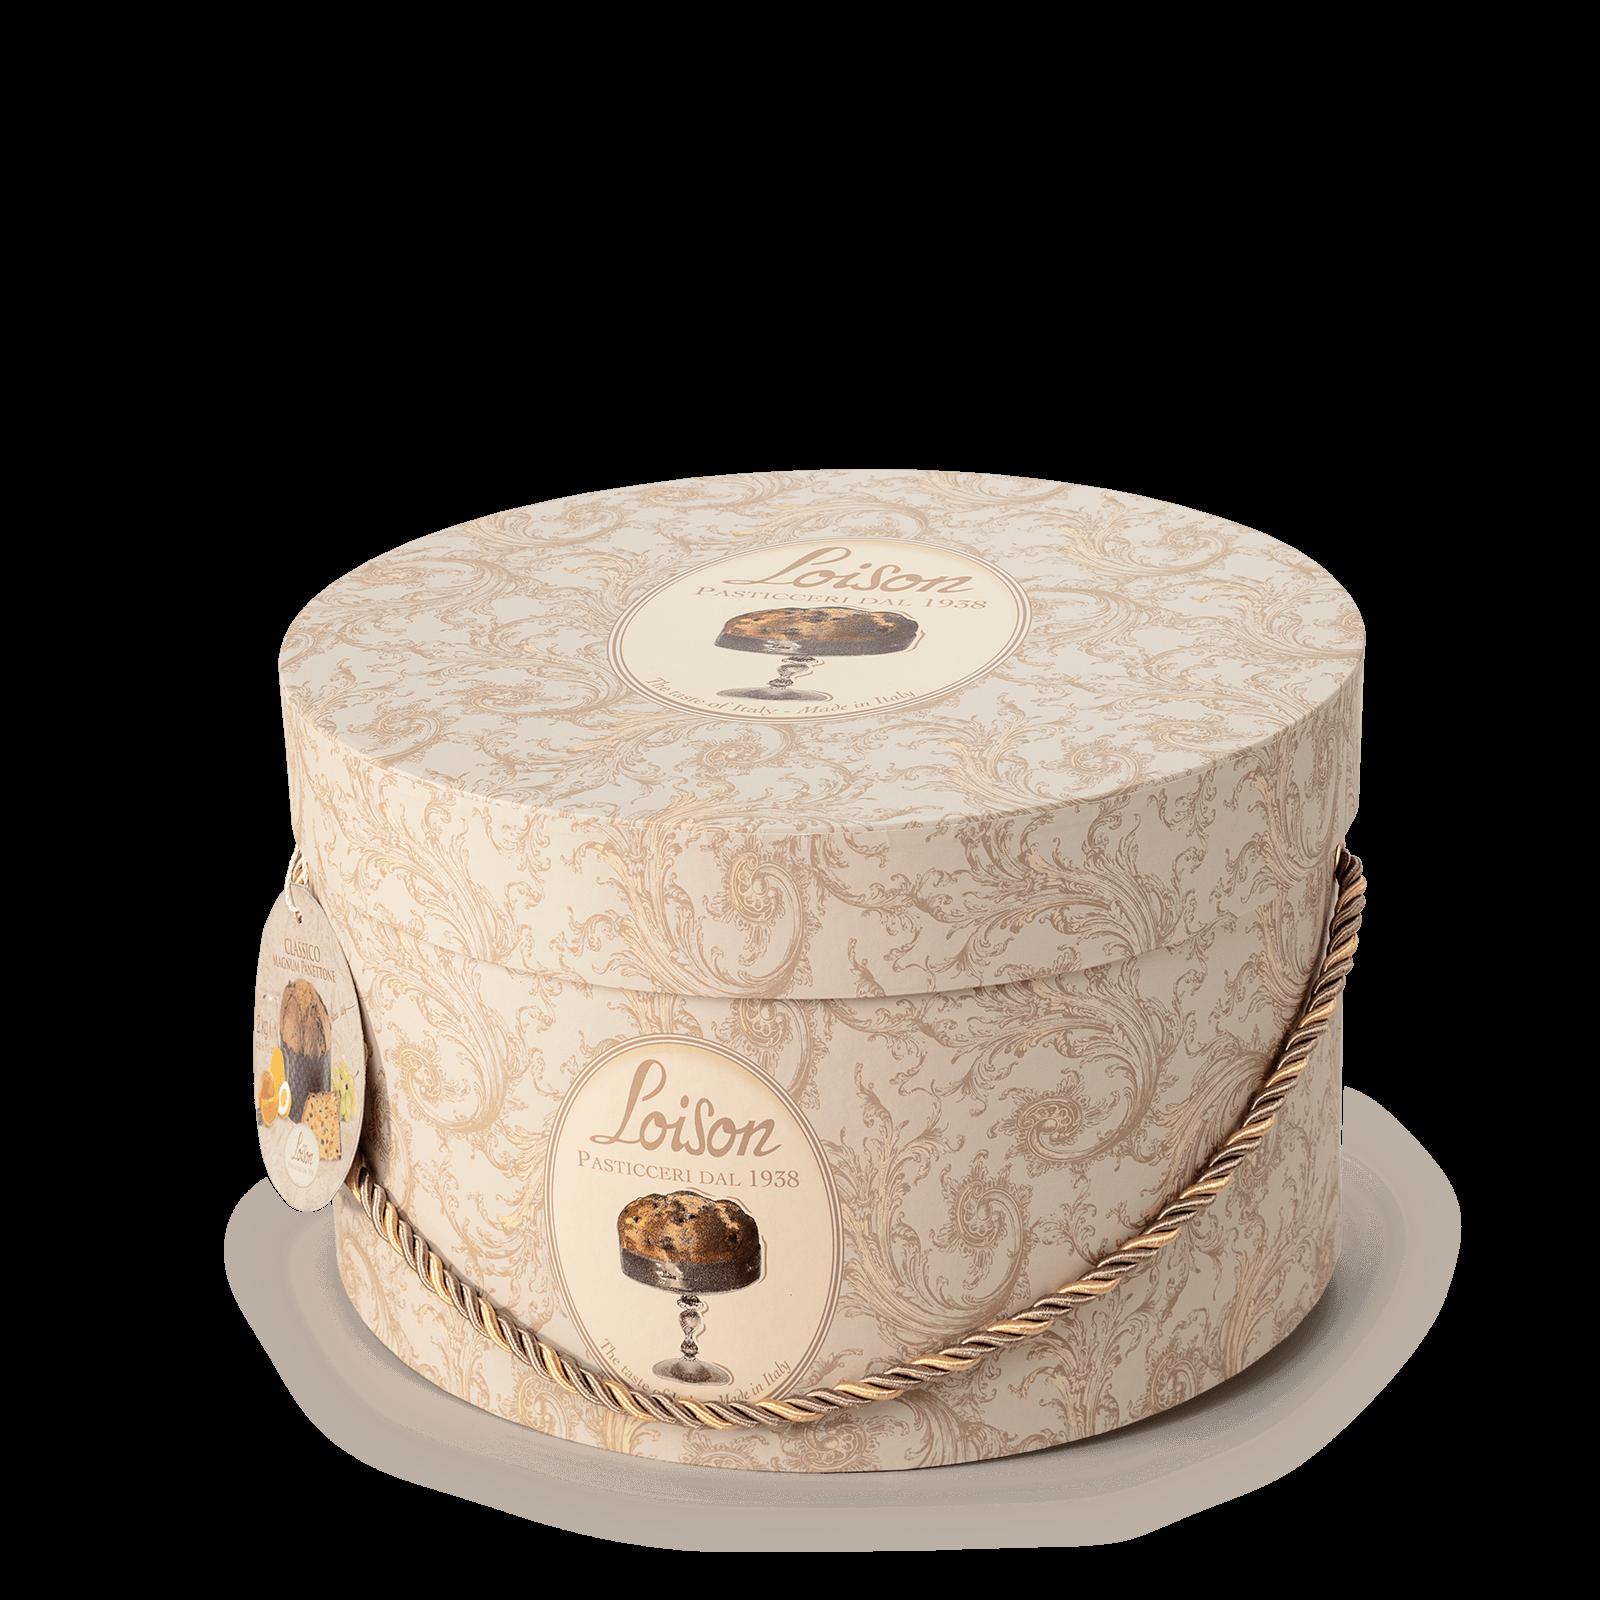 Classic Italian Panettone in a hat box Loison